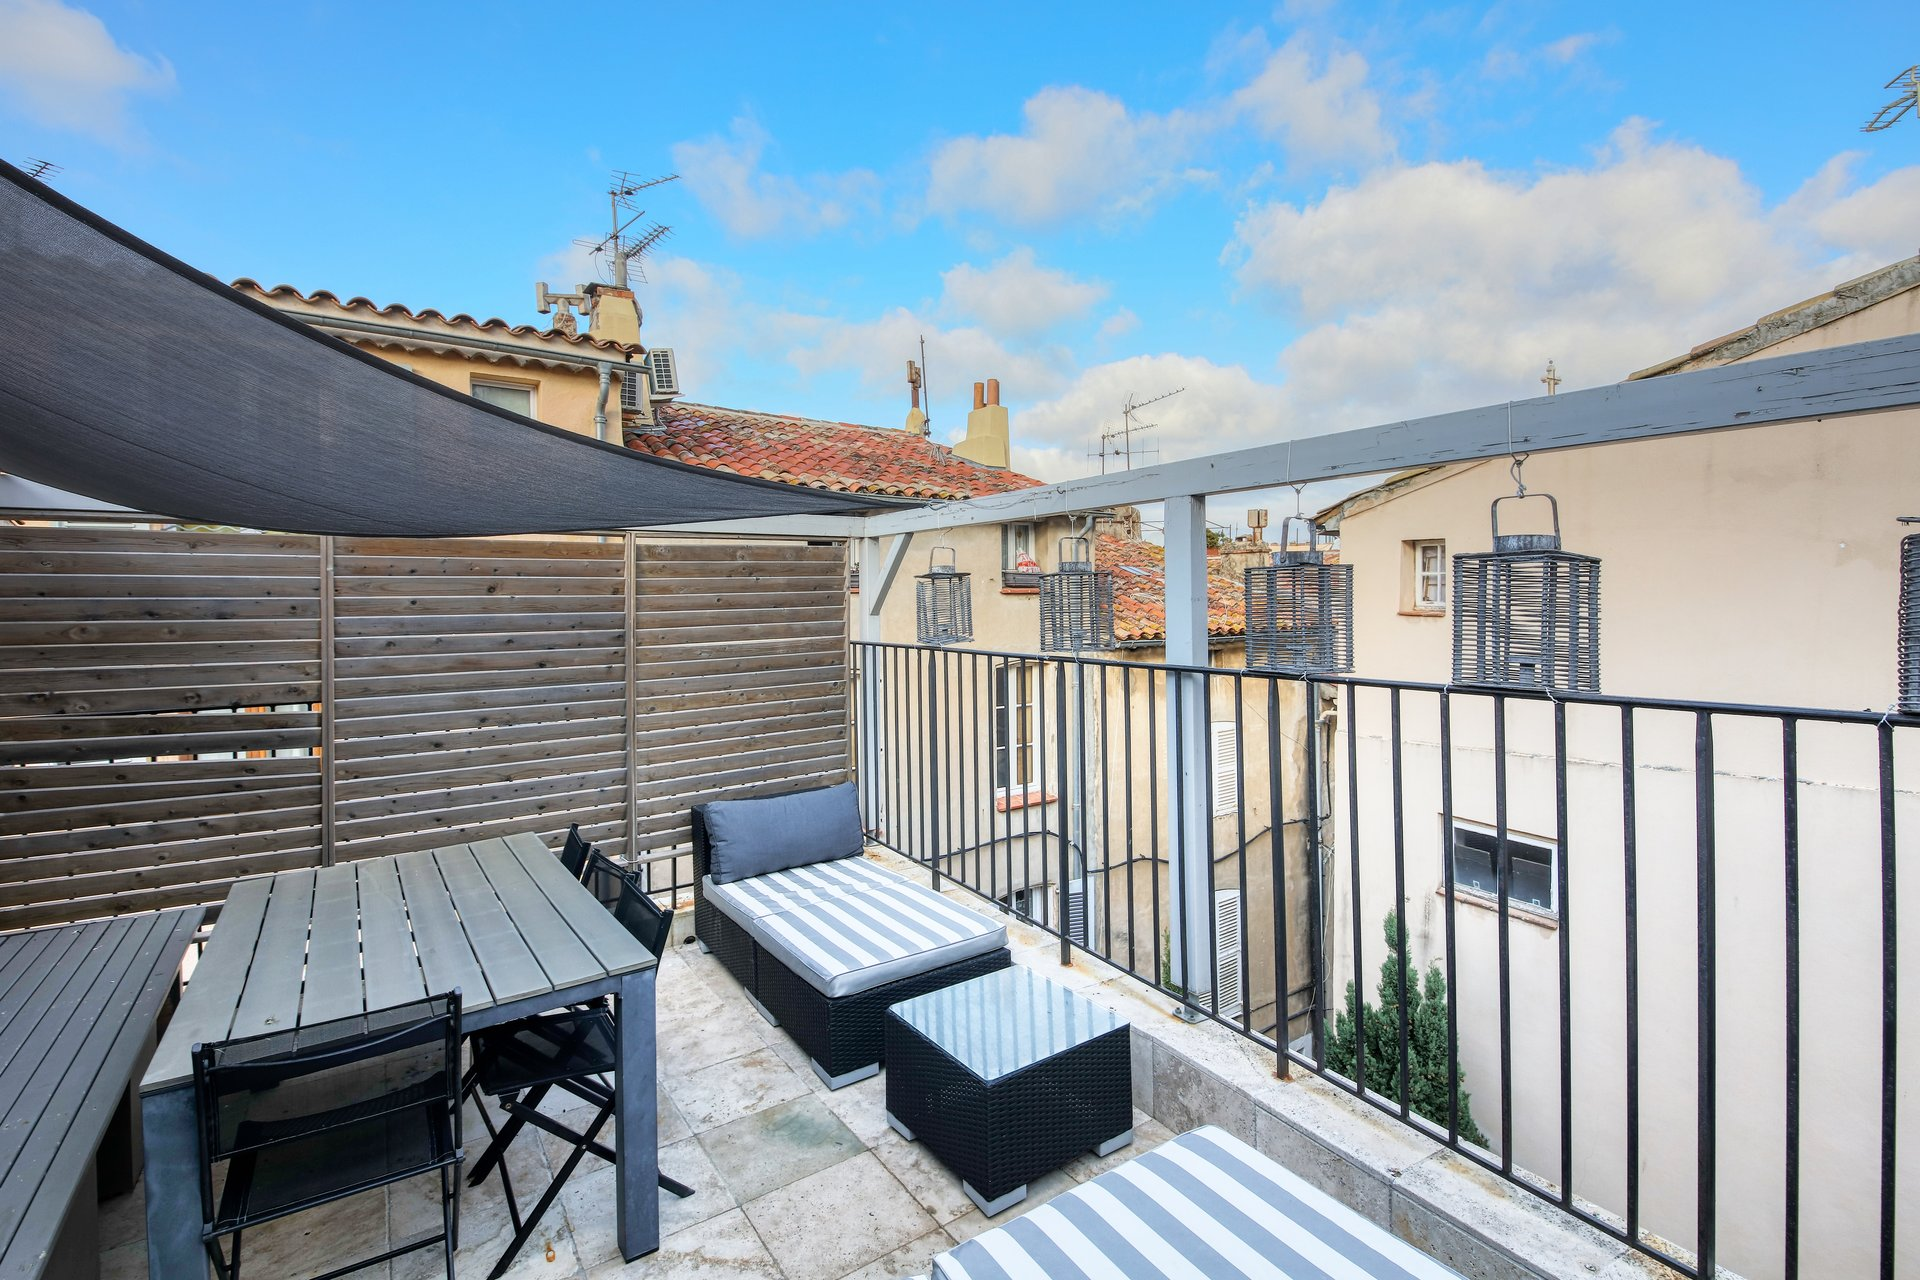 belle-maison-village-renovee-terrasse-tropezienne-air-conditionne-alarme